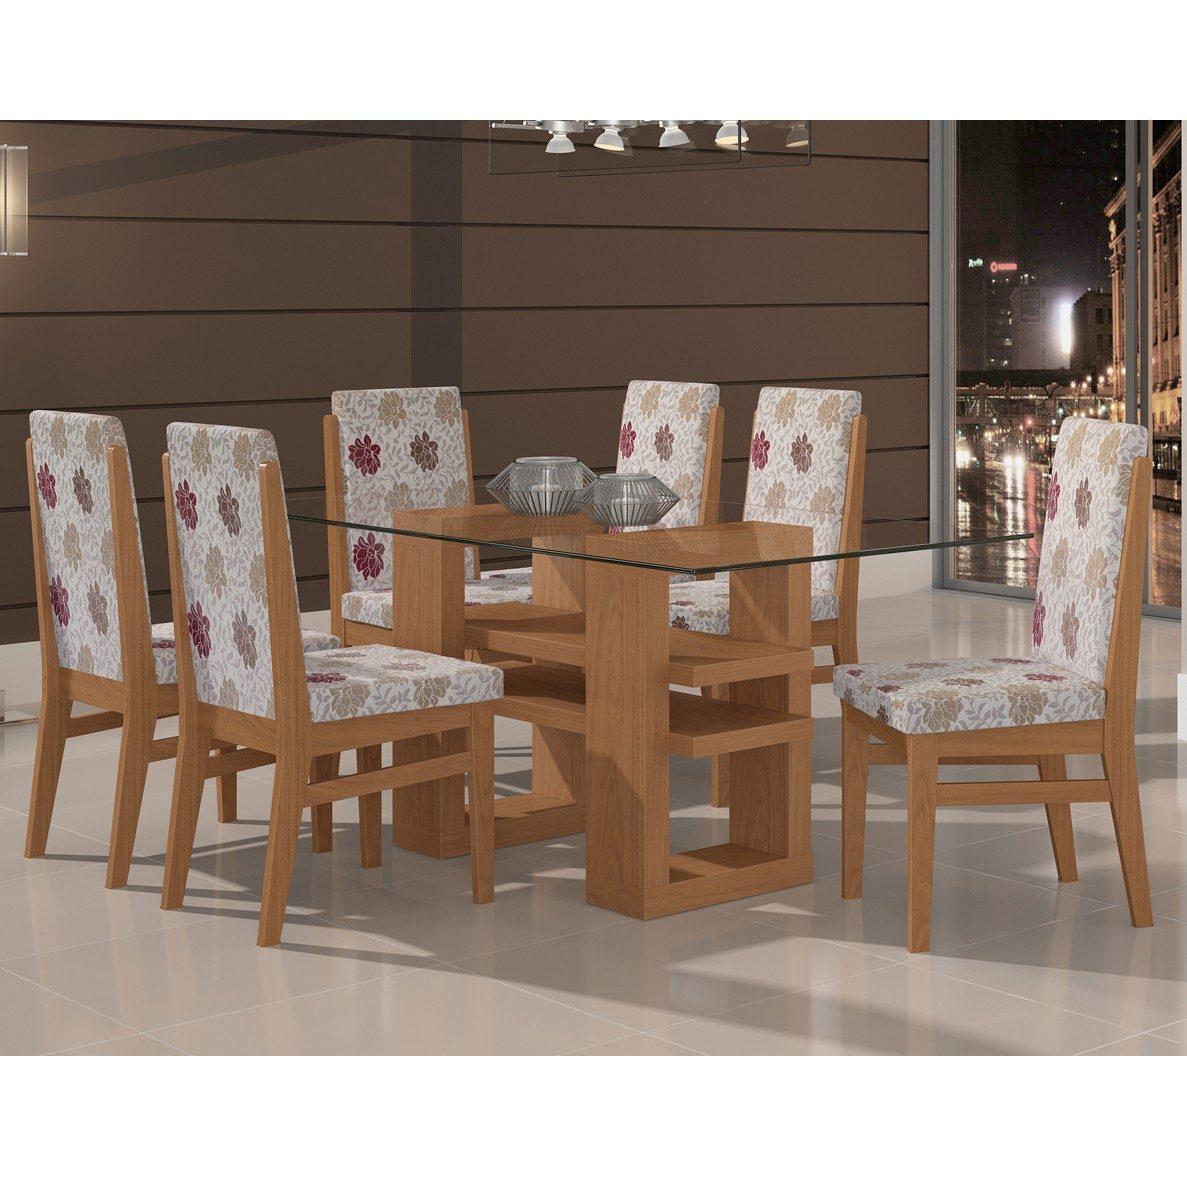 Conjunto Mesa Com 6 Cadeiras Jmarcon Star Imbuia Bege Listrado Bege  #8A6141 1187x1179